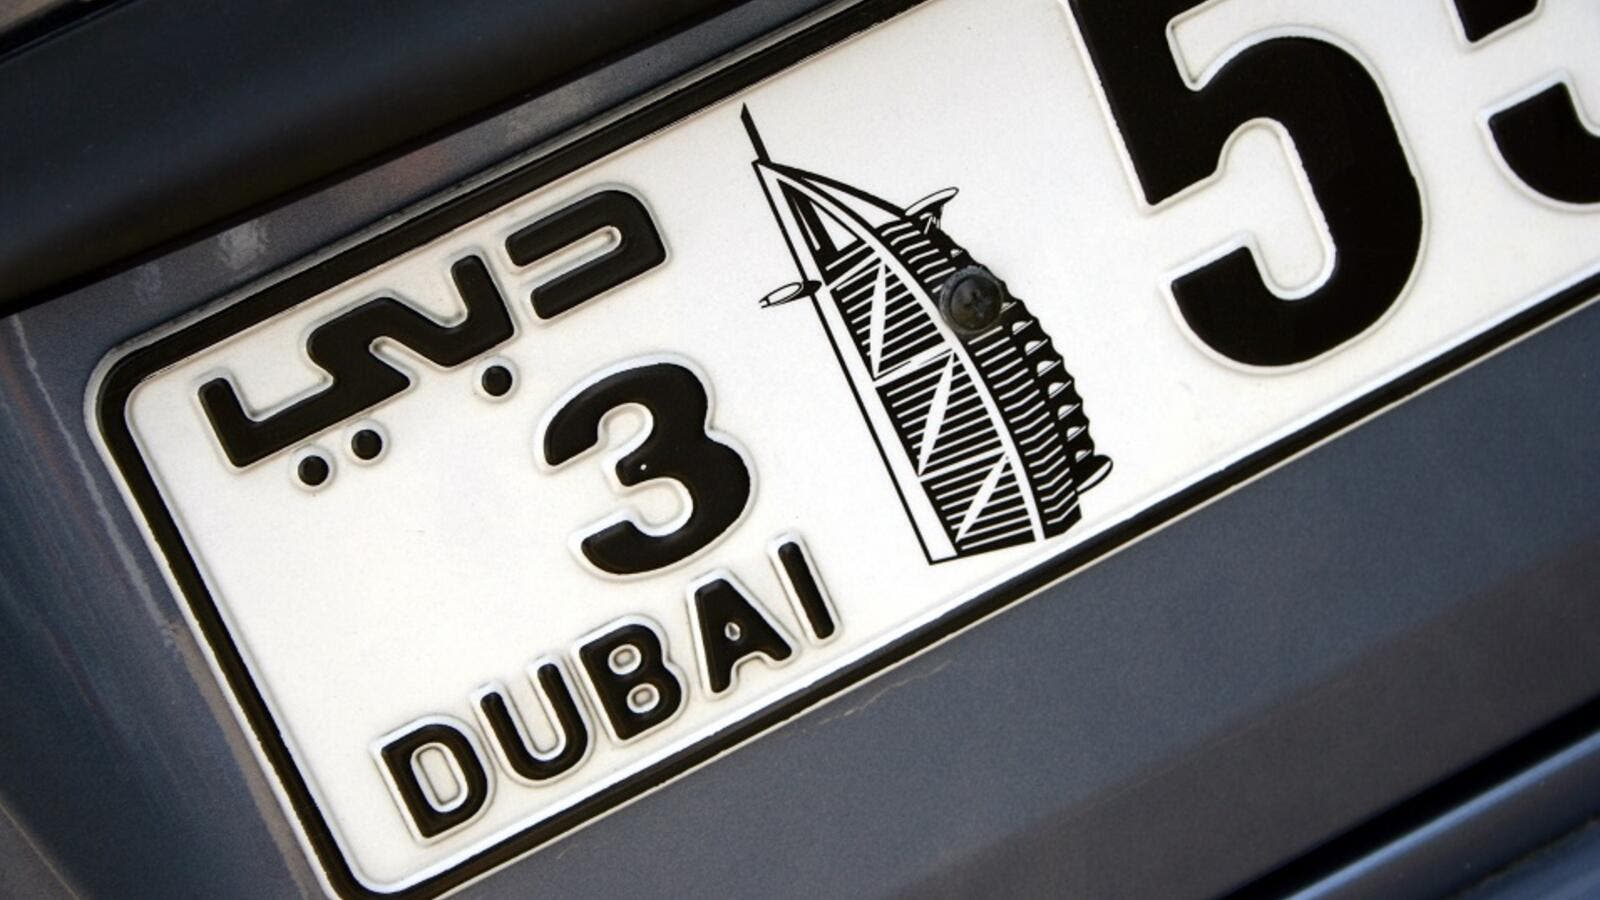 Dubai Inaugurated A First Of Its Kind Factory Al Bawaba